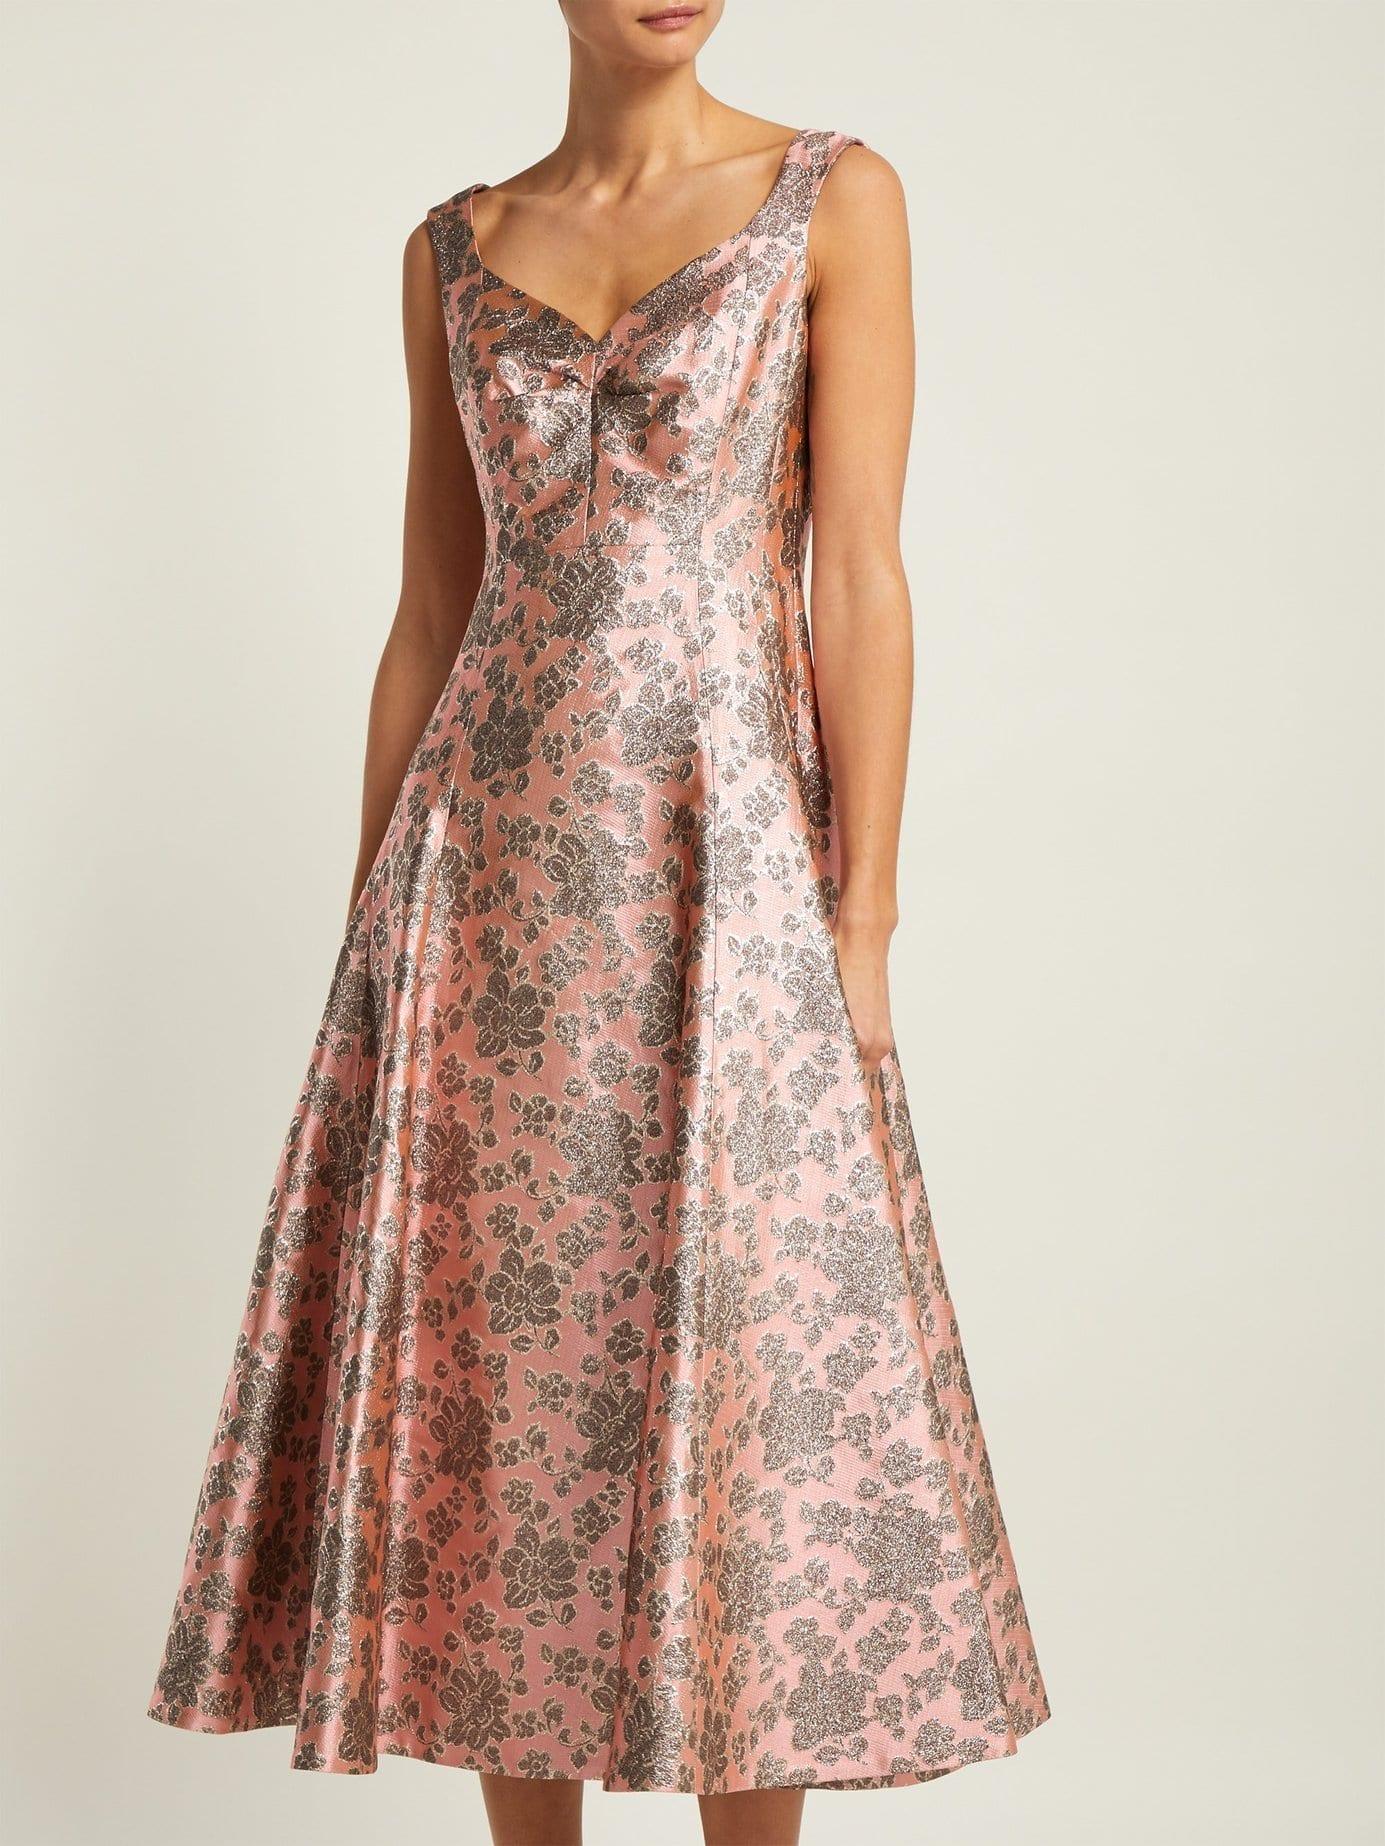 ERDEM Verna Floral Jacquard Midi Pink Dress